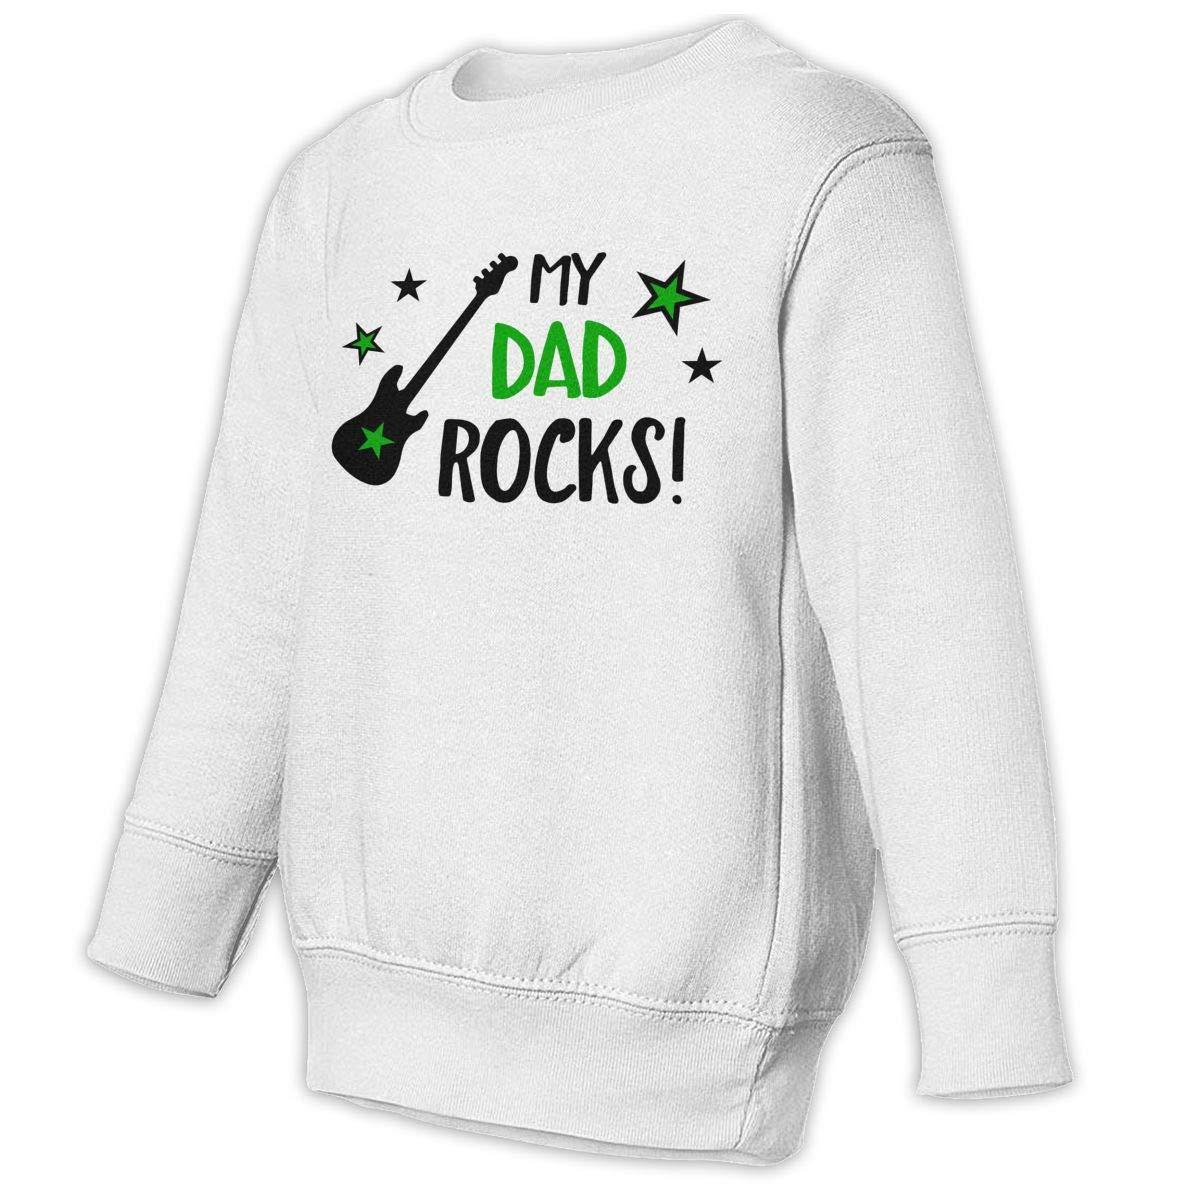 Guitar My Dad Rocks Baby Sweatshirt Lovely Toddler Hoodies Cotton T Shirts